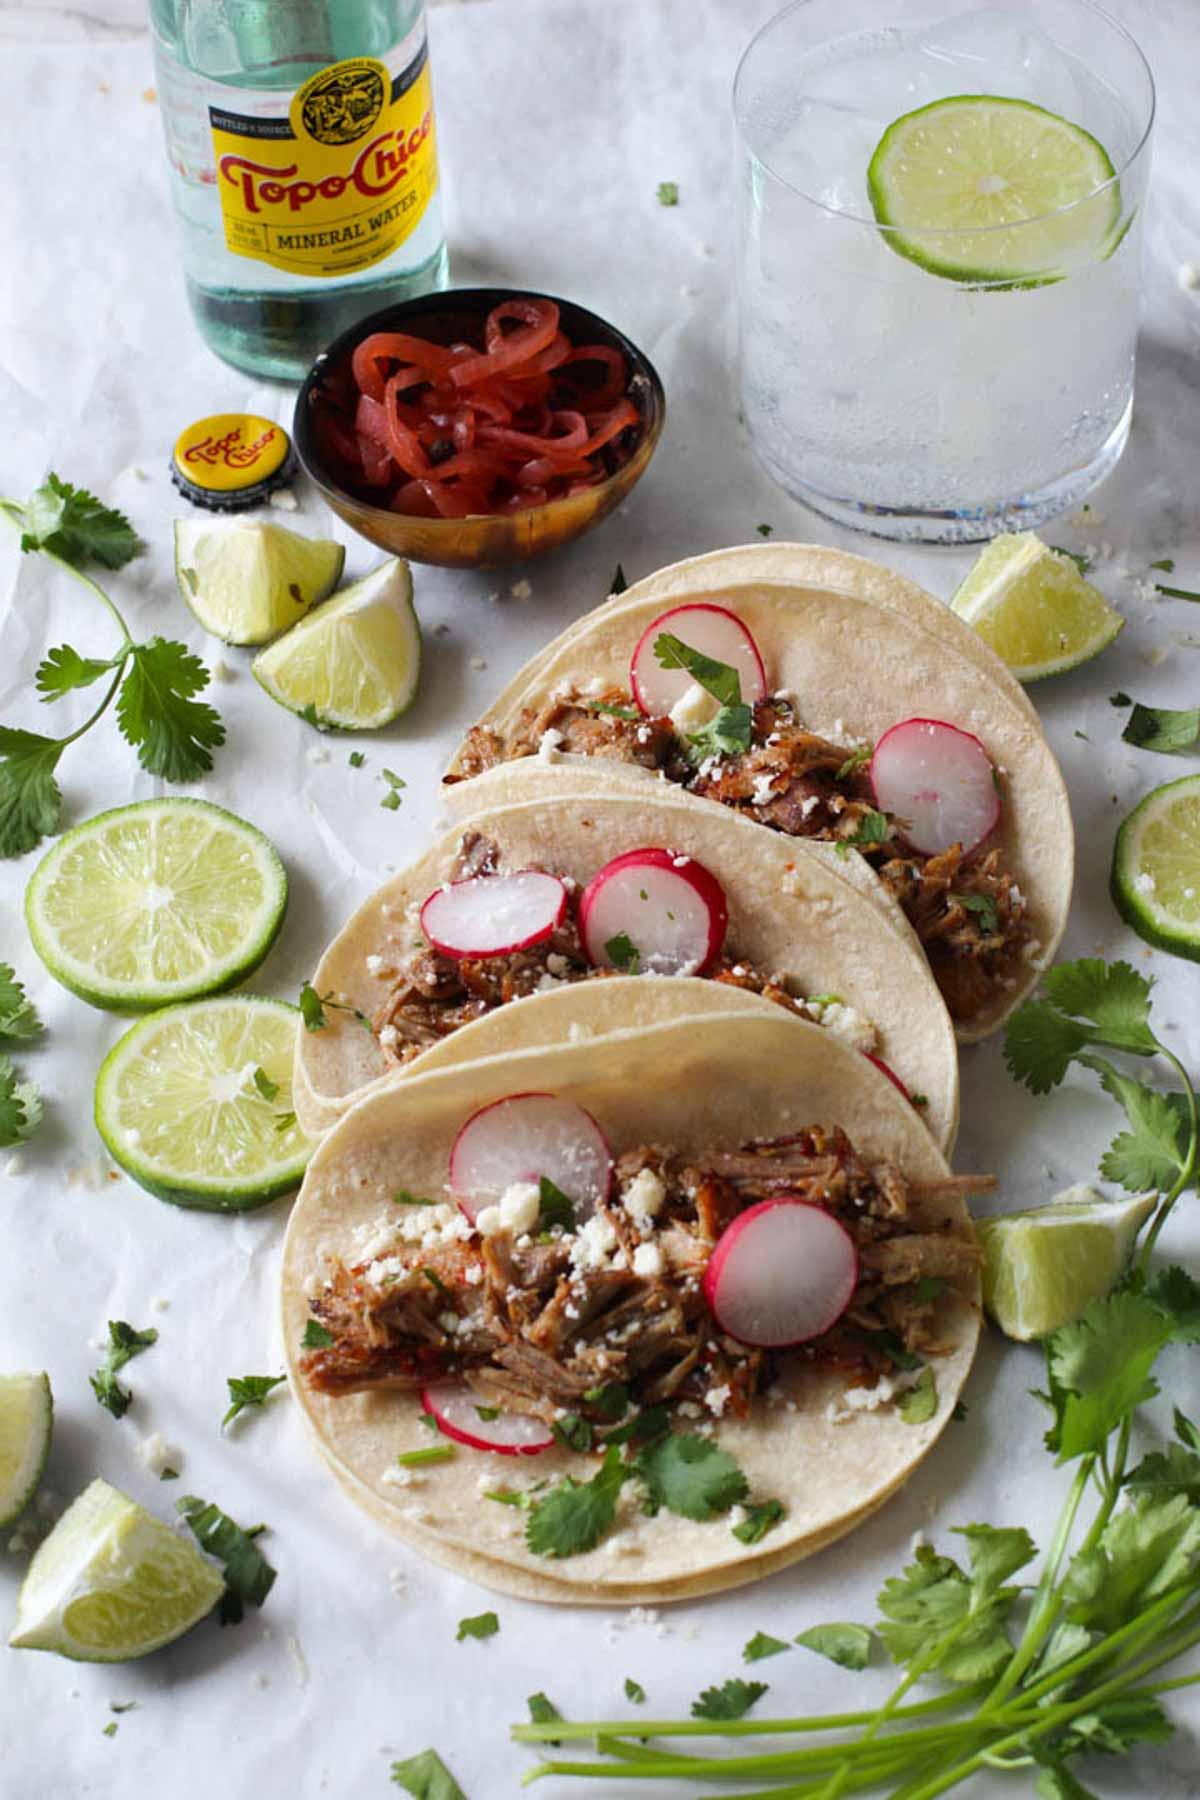 3 pork carnitas tacos garnished with slices of radish, lime served in corn tortillas